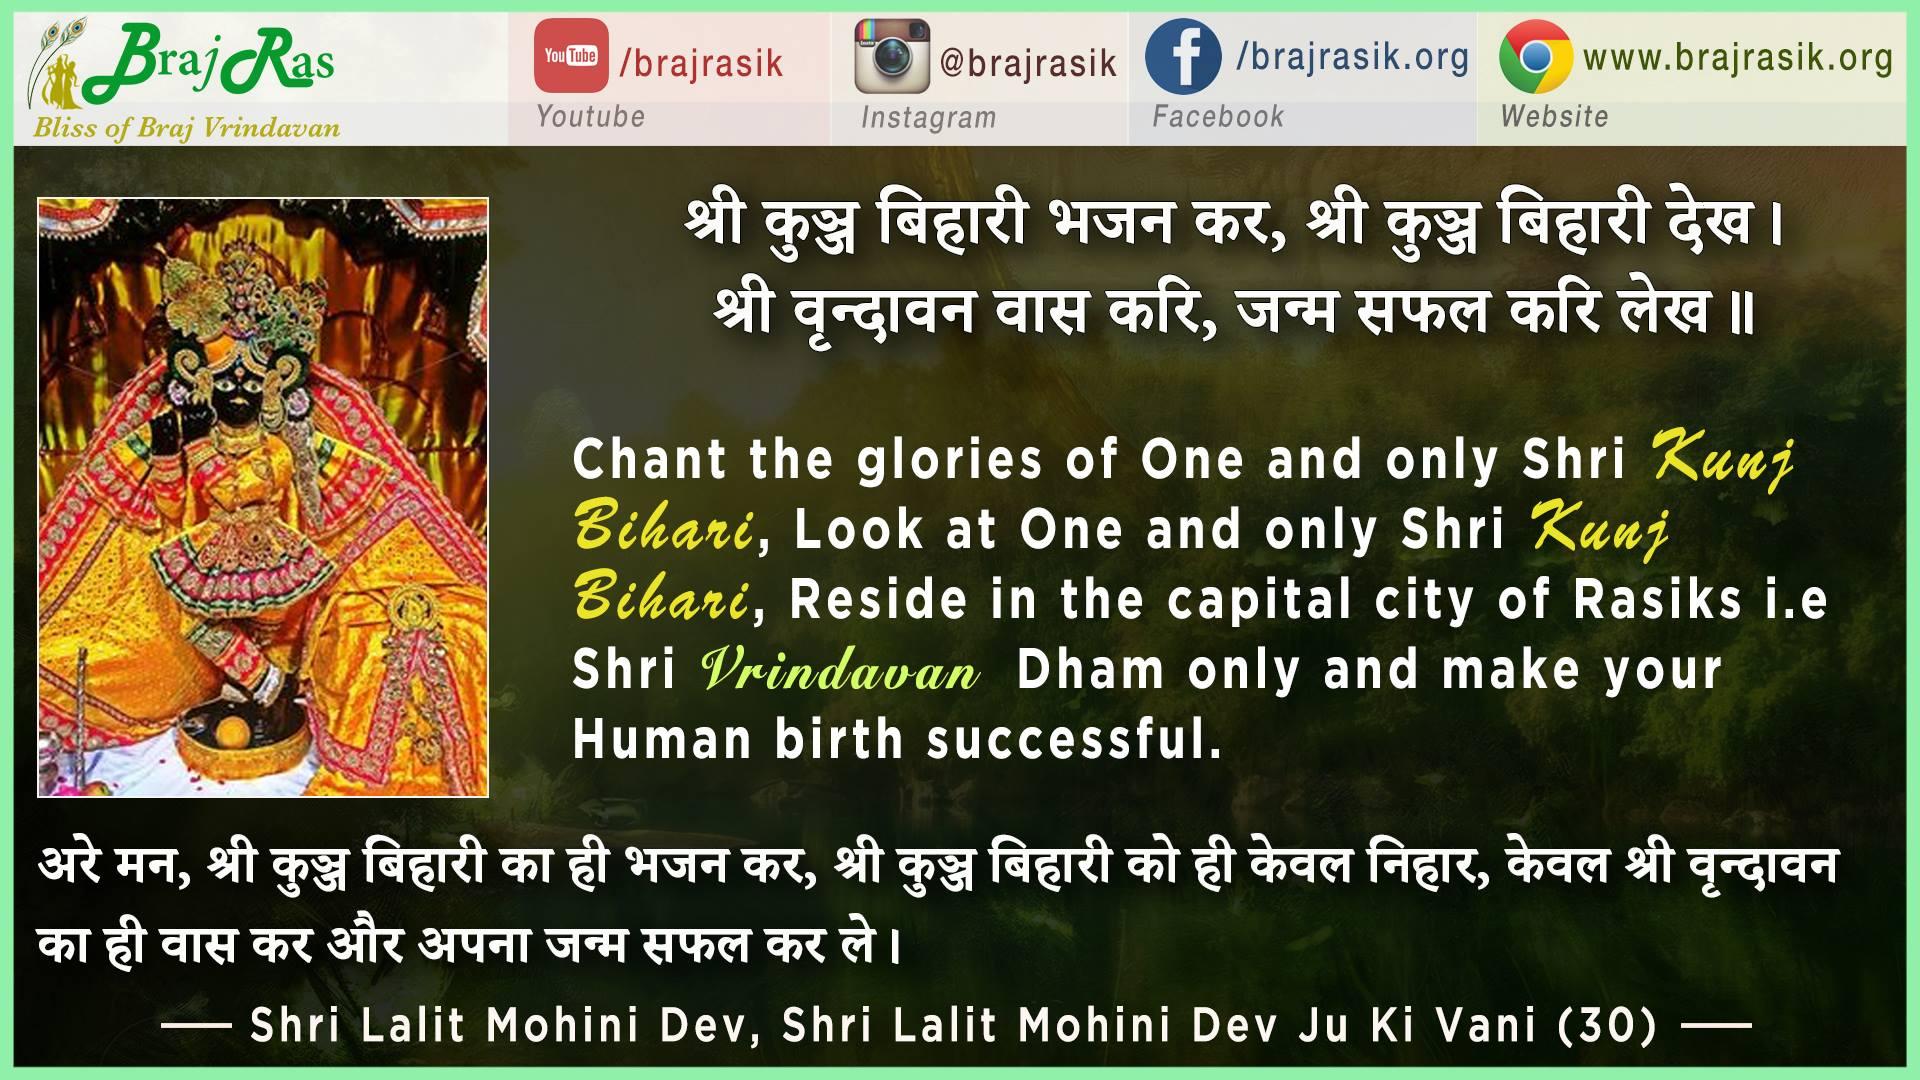 Shri Kunj Bihari Bjahan Kar, Shri Kunj Bihari Dekh - Shri Lalit Mohini Dev, Shri Lalit Mohini Dev Ju Ki Vani (30)